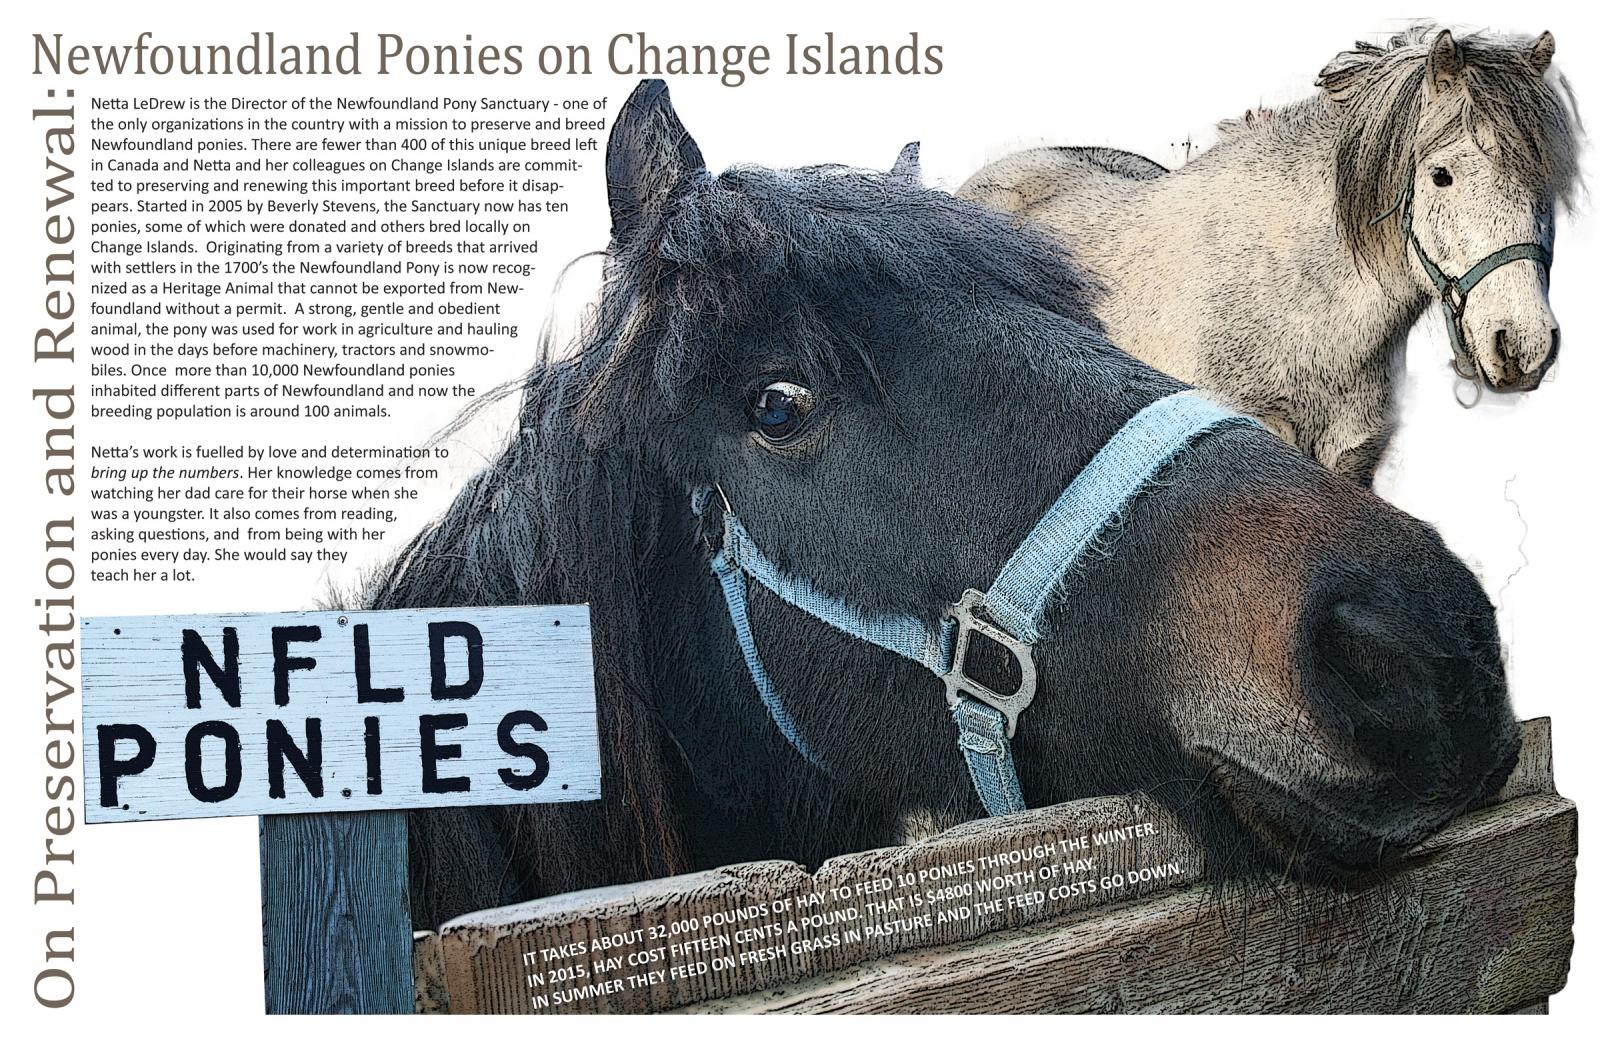 On Preservation and Renewal: Newfoundland Ponies on Change Islands